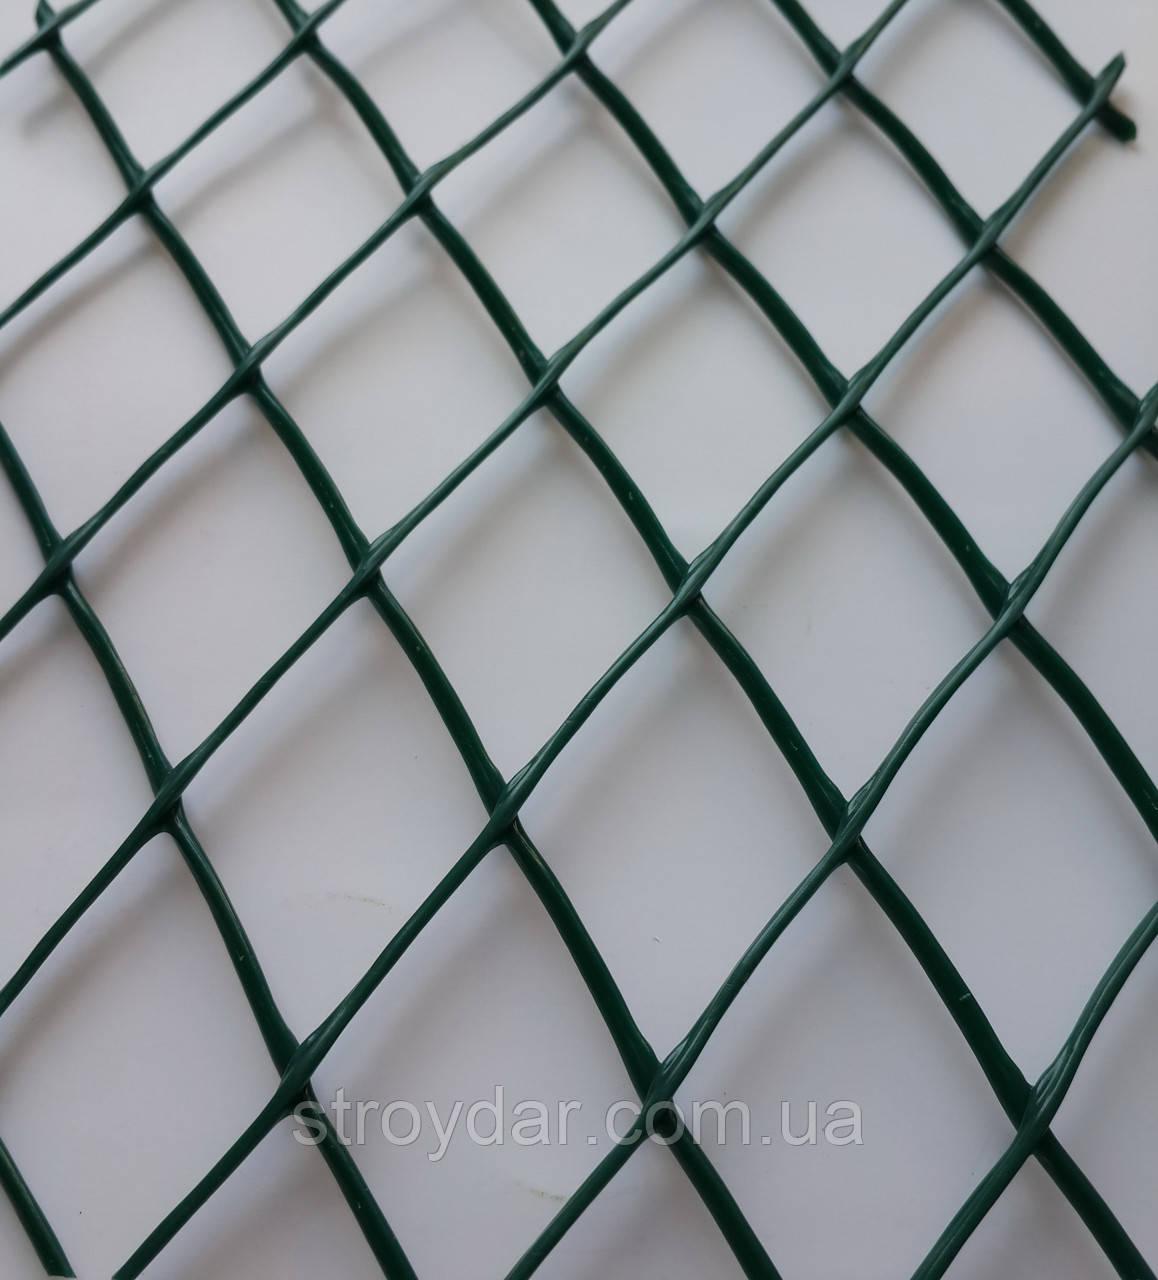 Сетка пластиковая декоративная ромб ДР 30 Темно-зеленая